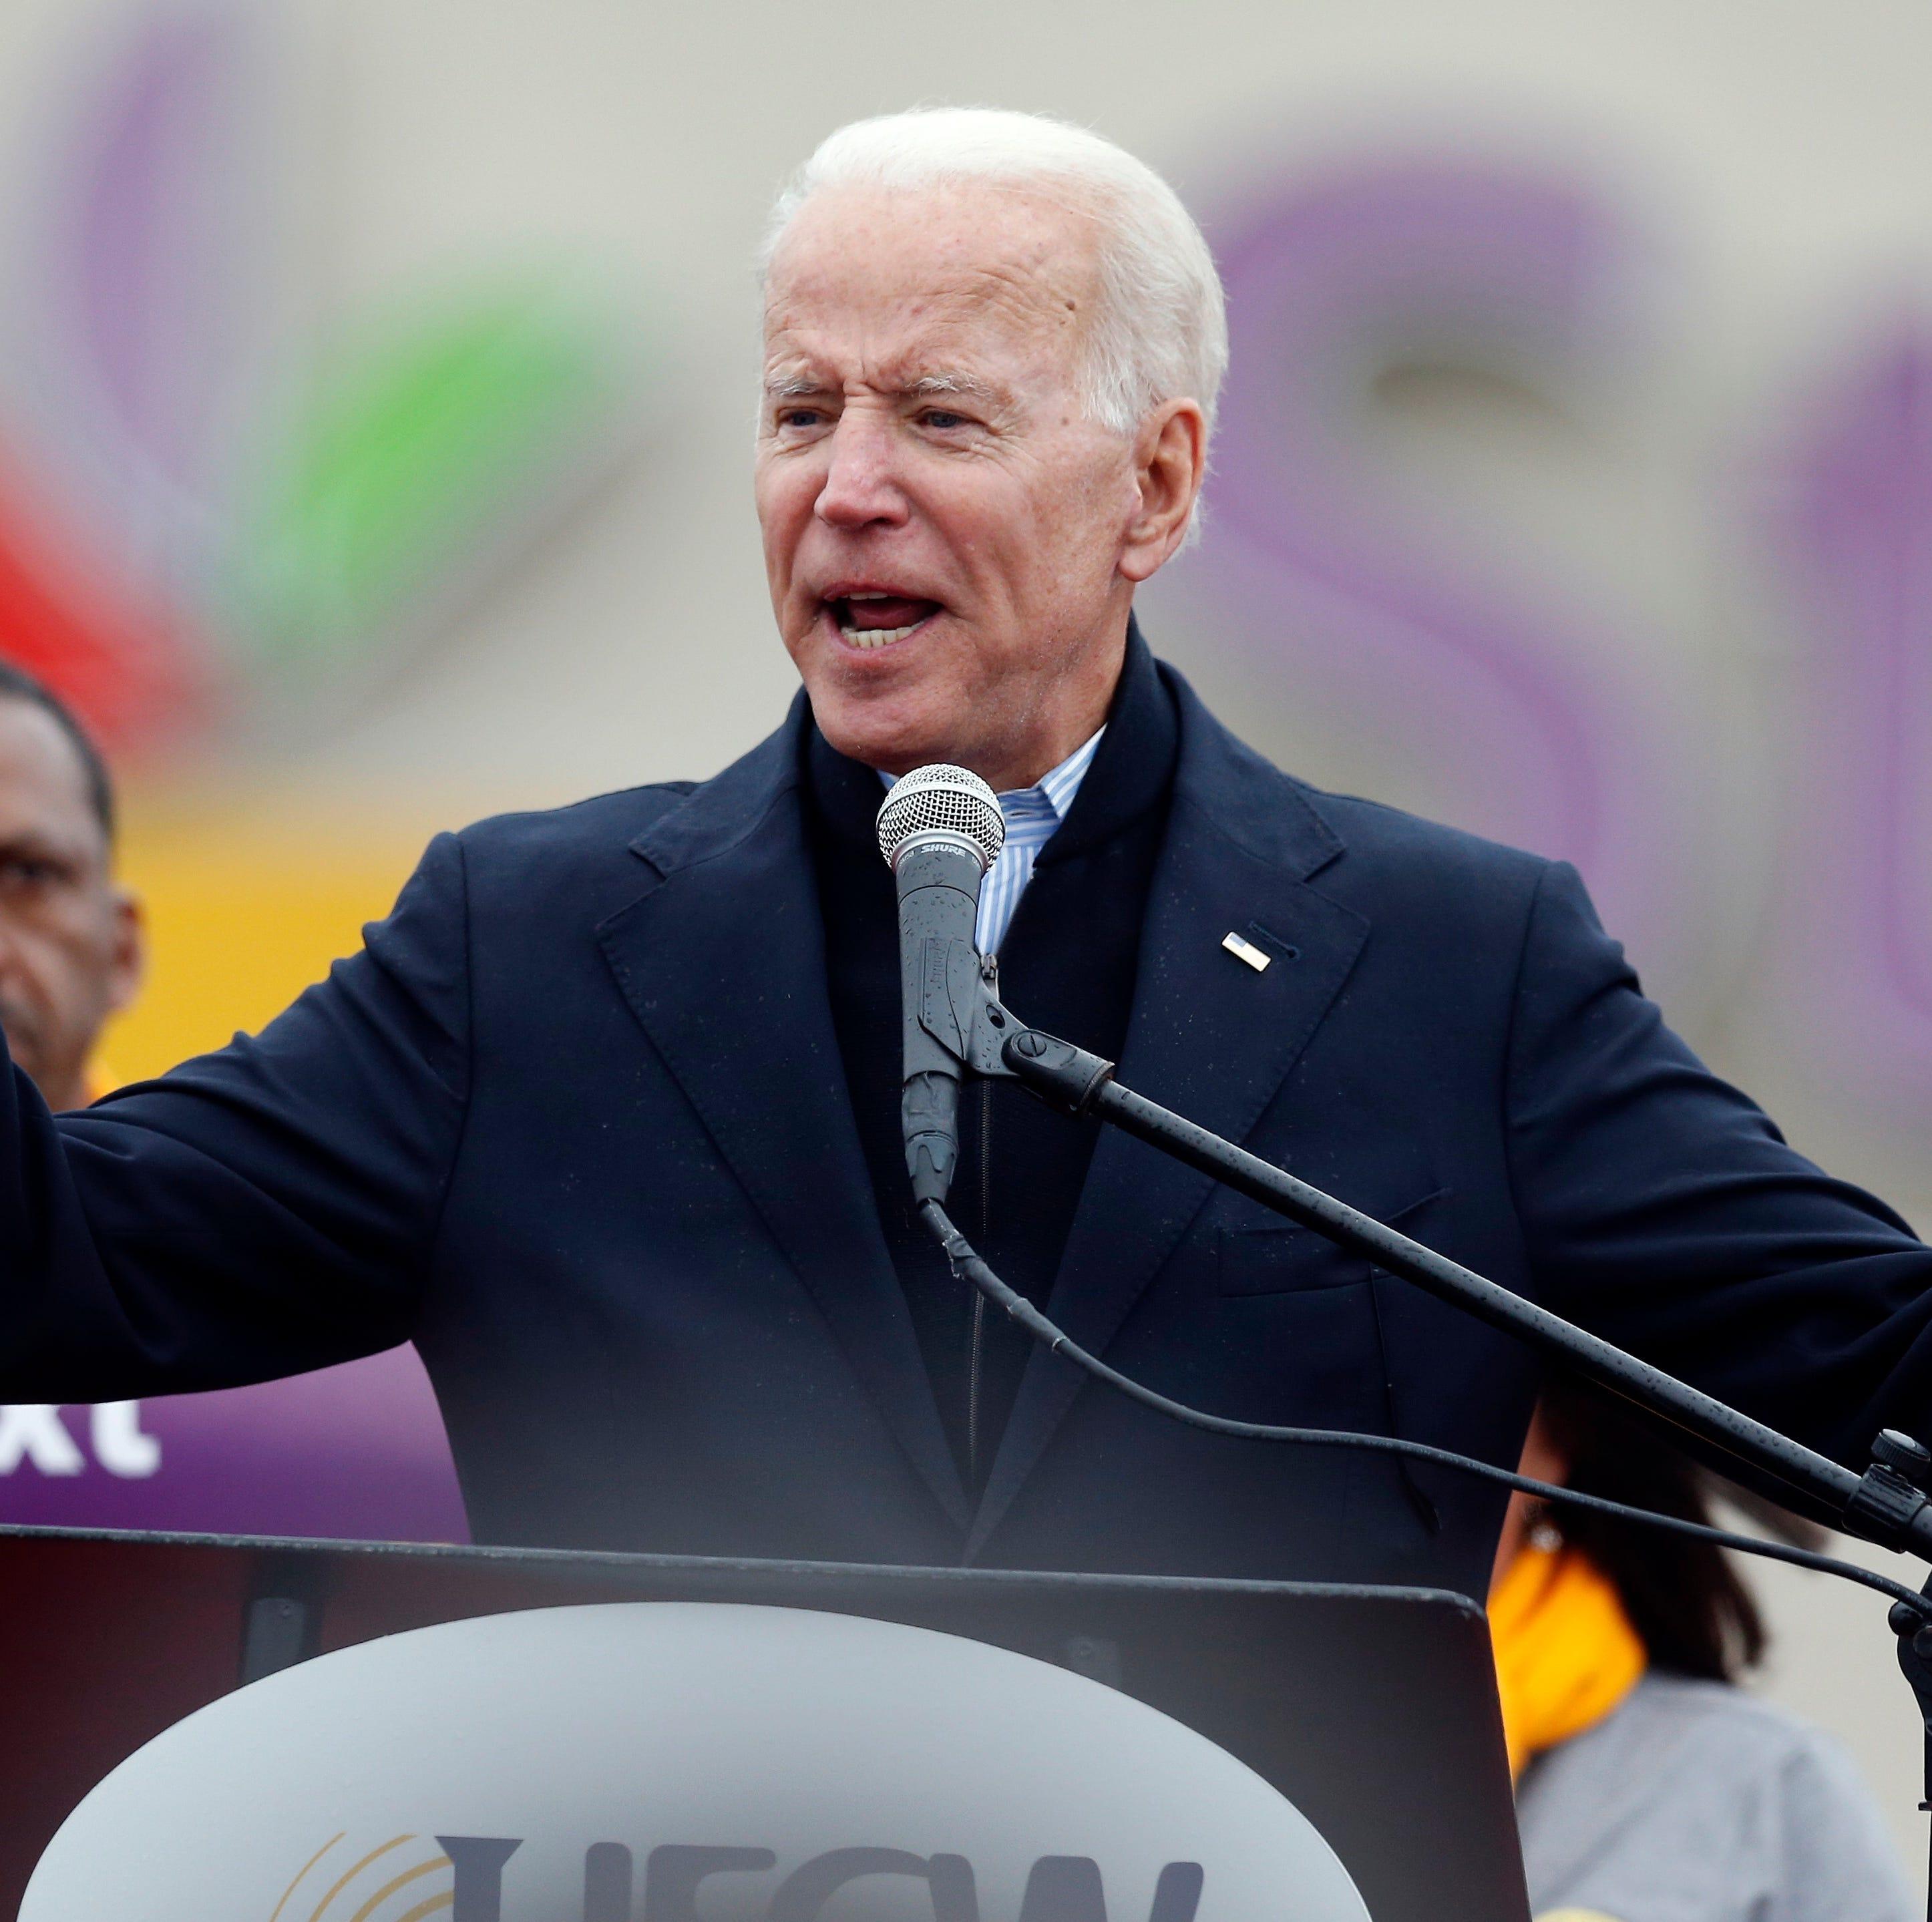 Lucy Flores calls Joe Biden's jokes about touching 'disrespectful'